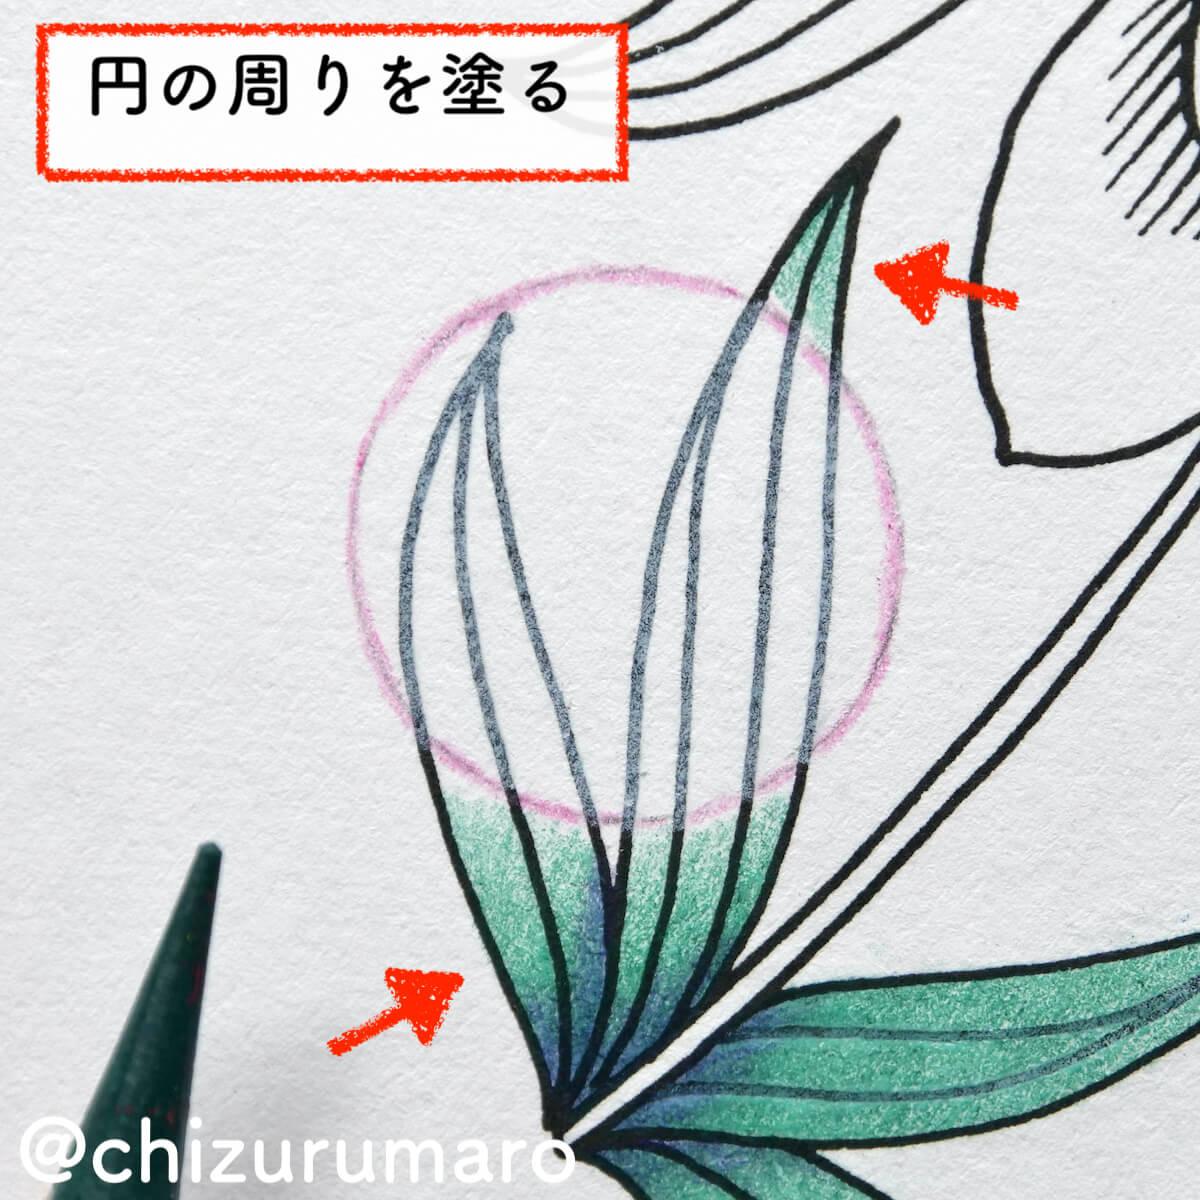 f:id:chizurumaro:20210819125855j:plain